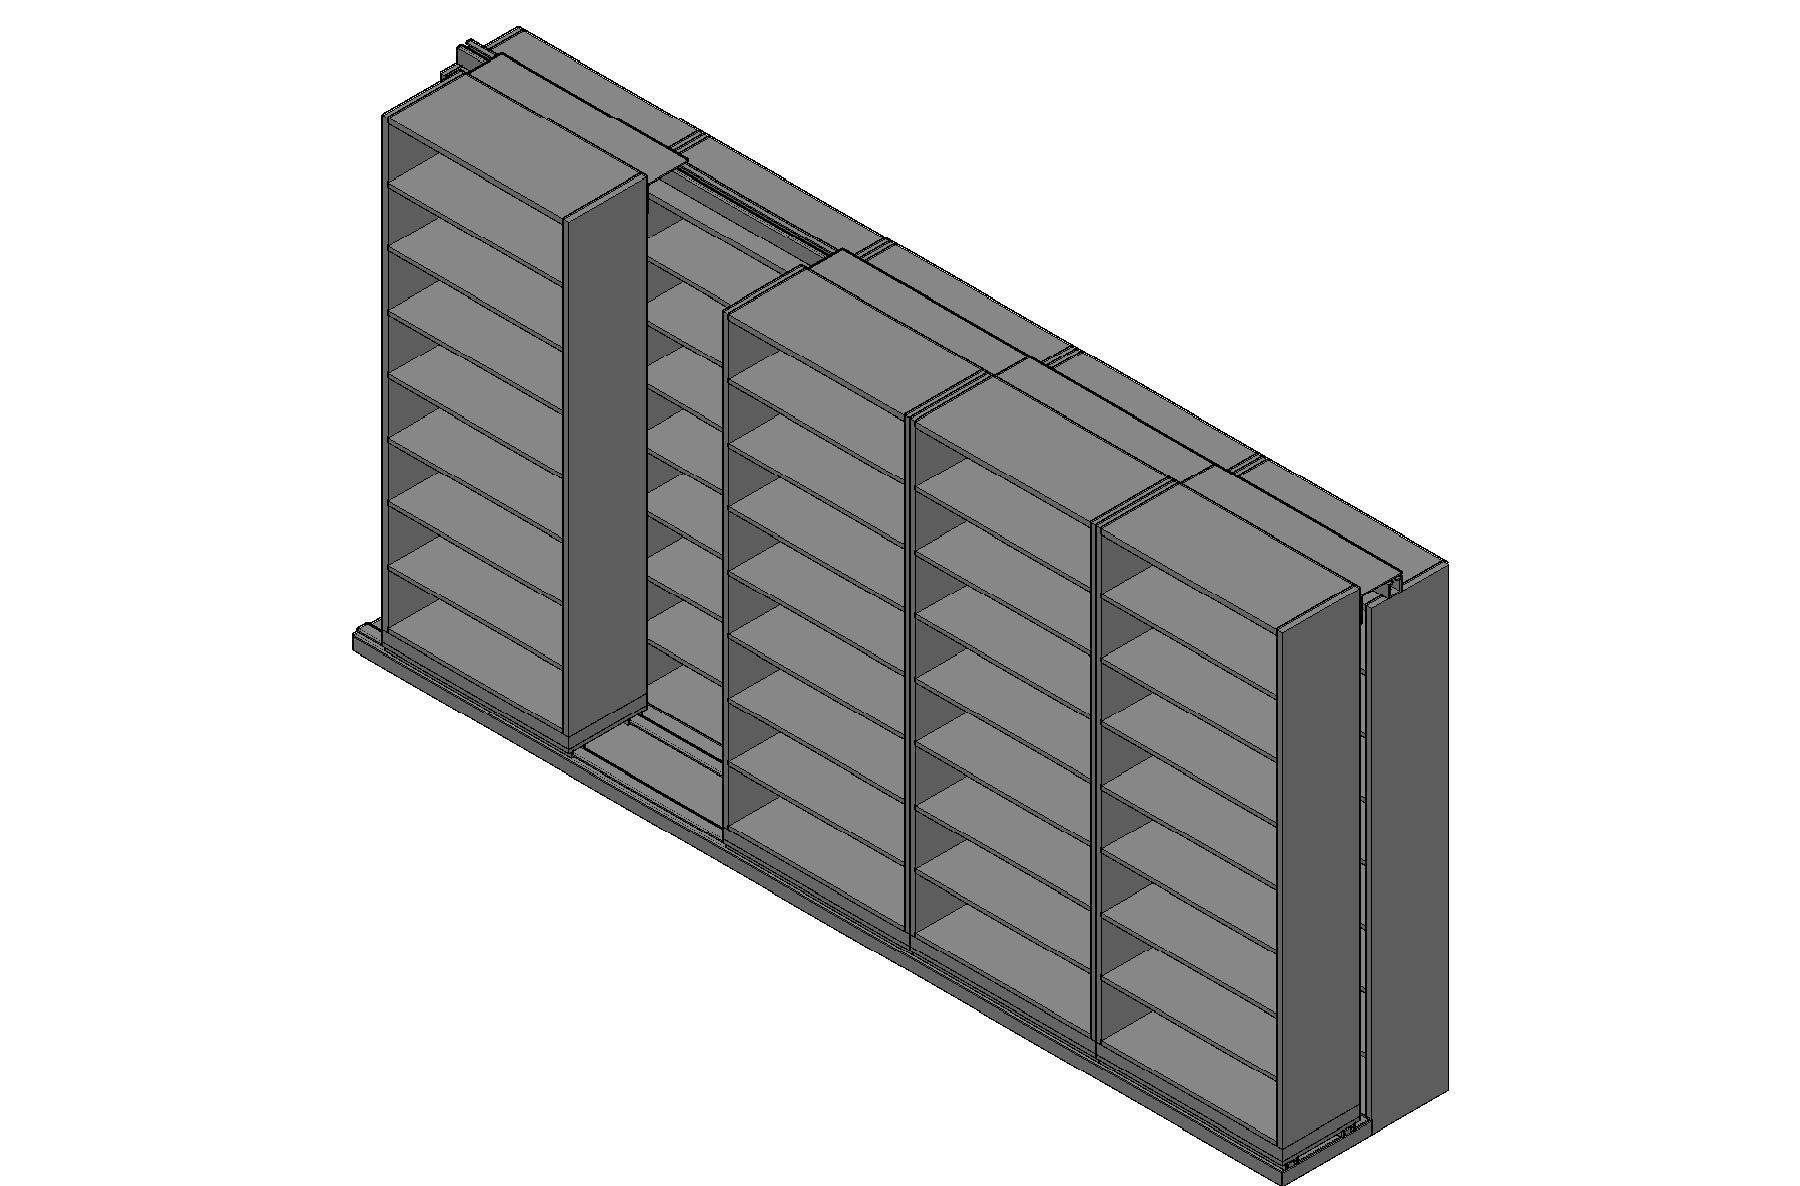 "Legal Size Sliding Shelves - 2 Rows Deep - 8 Levels - (36"" x 15"" Shelves) - 184"" Total Width"